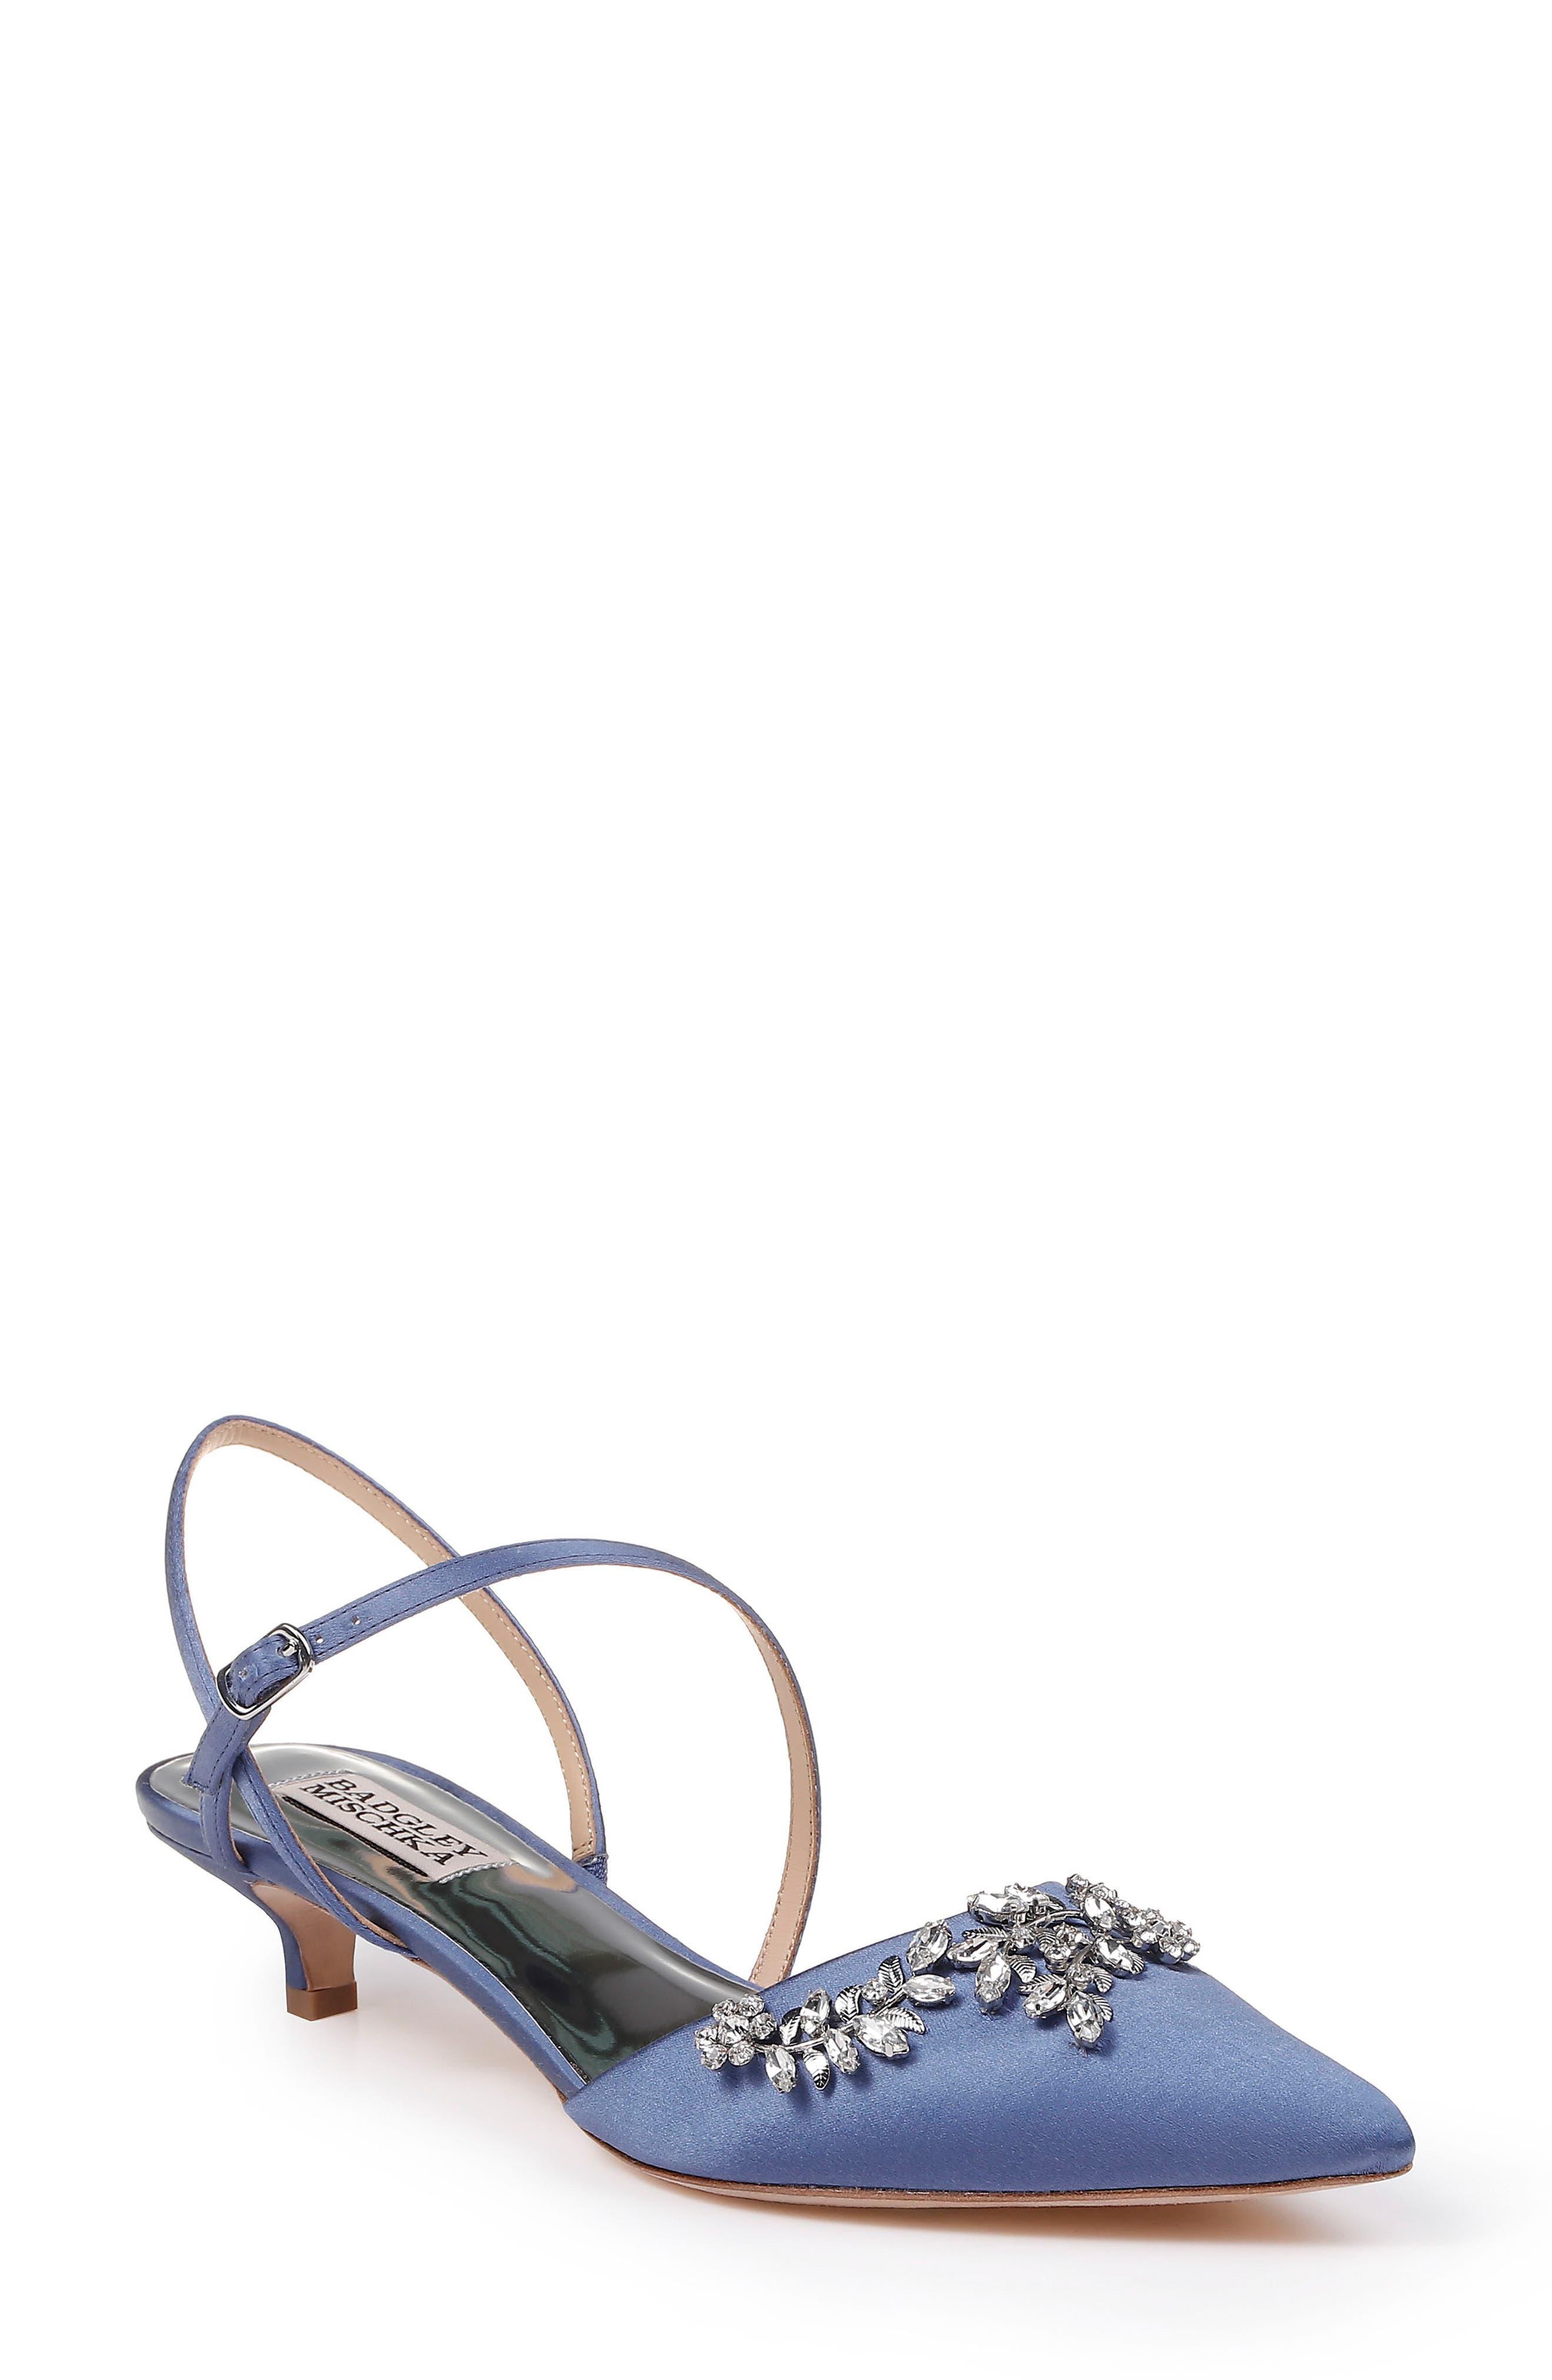 ,                             Badgley Mischka Crystal Embellished Quarter Strap Pump,                             Main thumbnail 1, color,                             ITALIAN BLUE SATIN